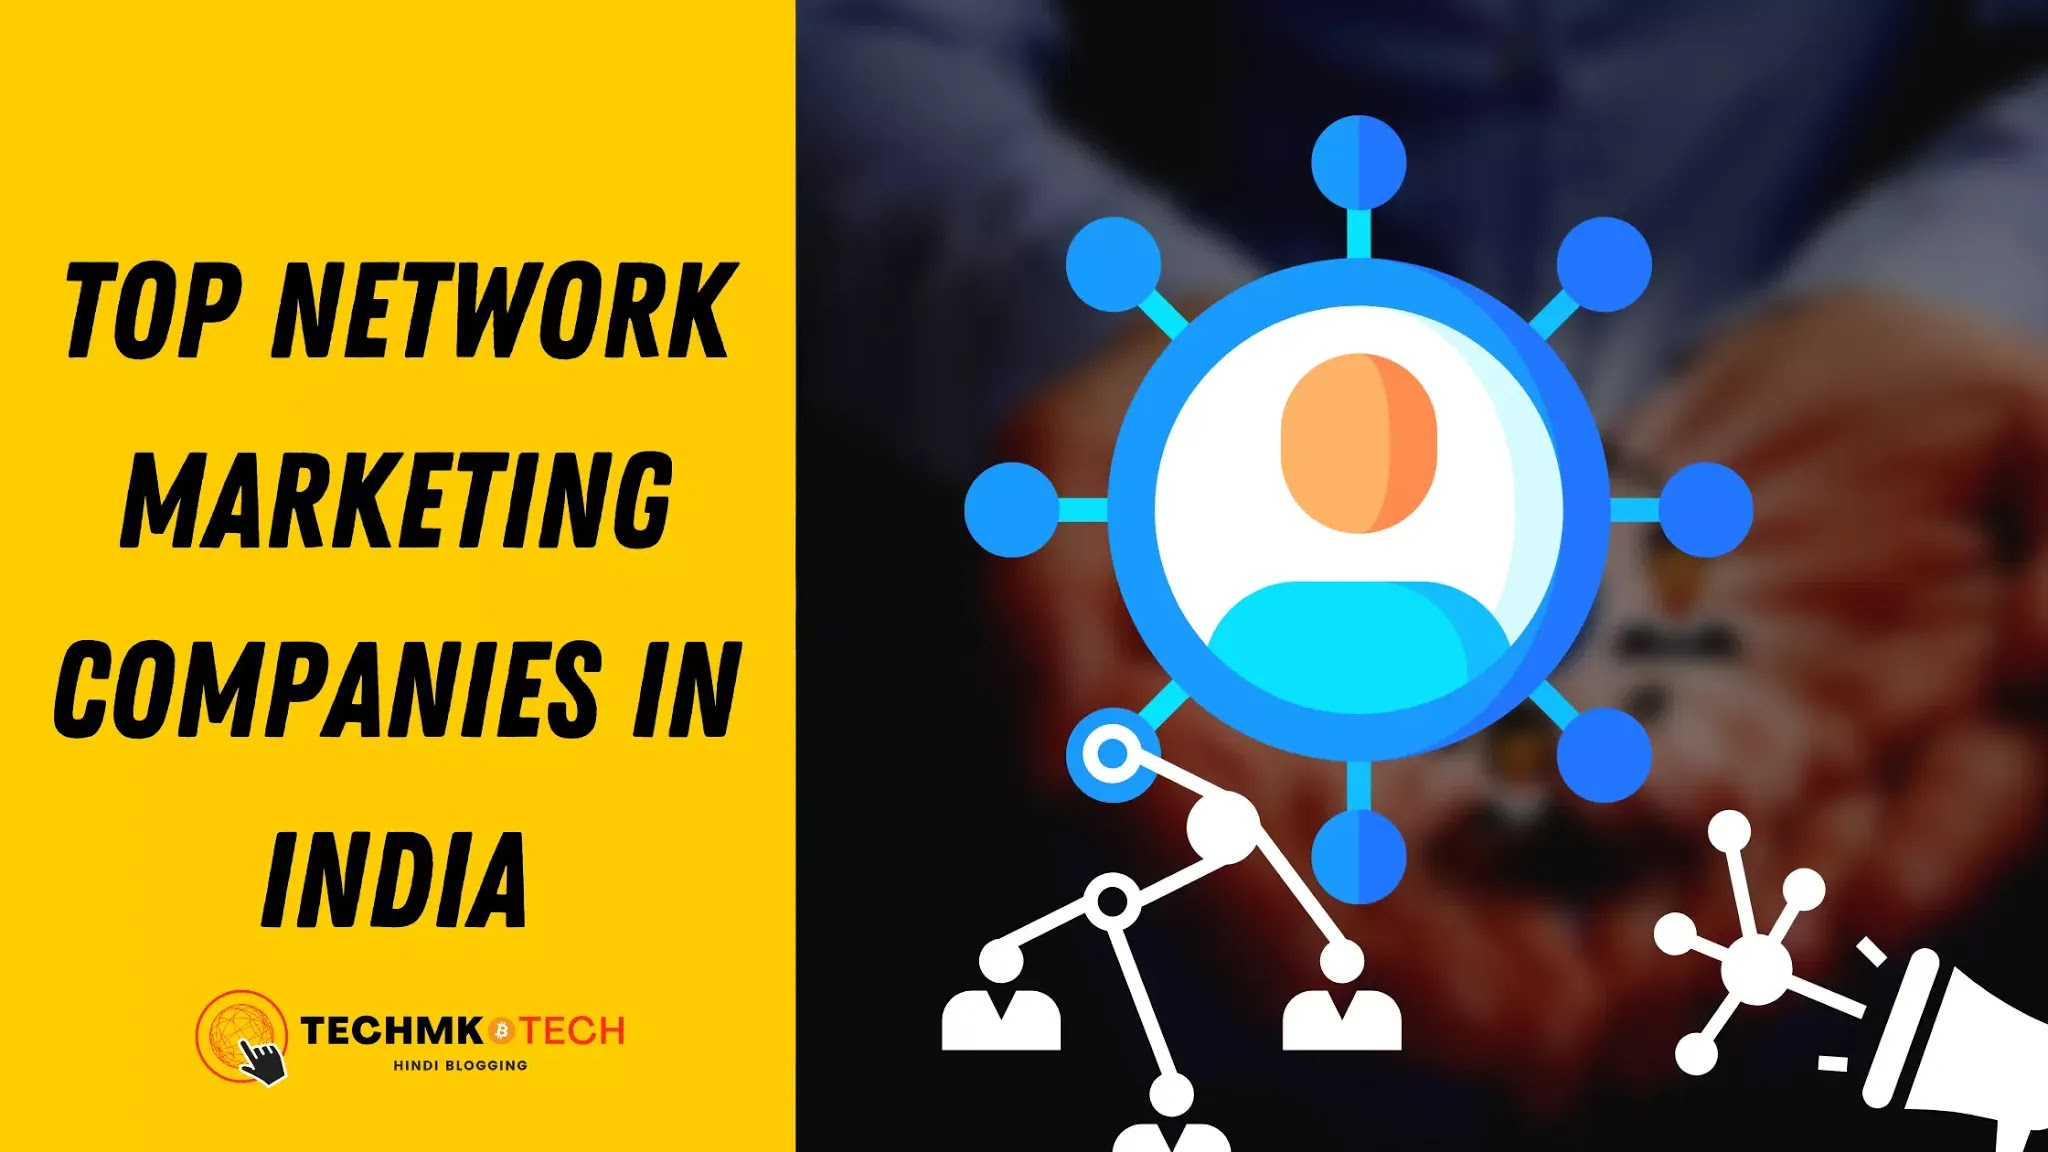 India no 1 network marketing company, Top 5 network marketing company, network. Marketing companies in India,